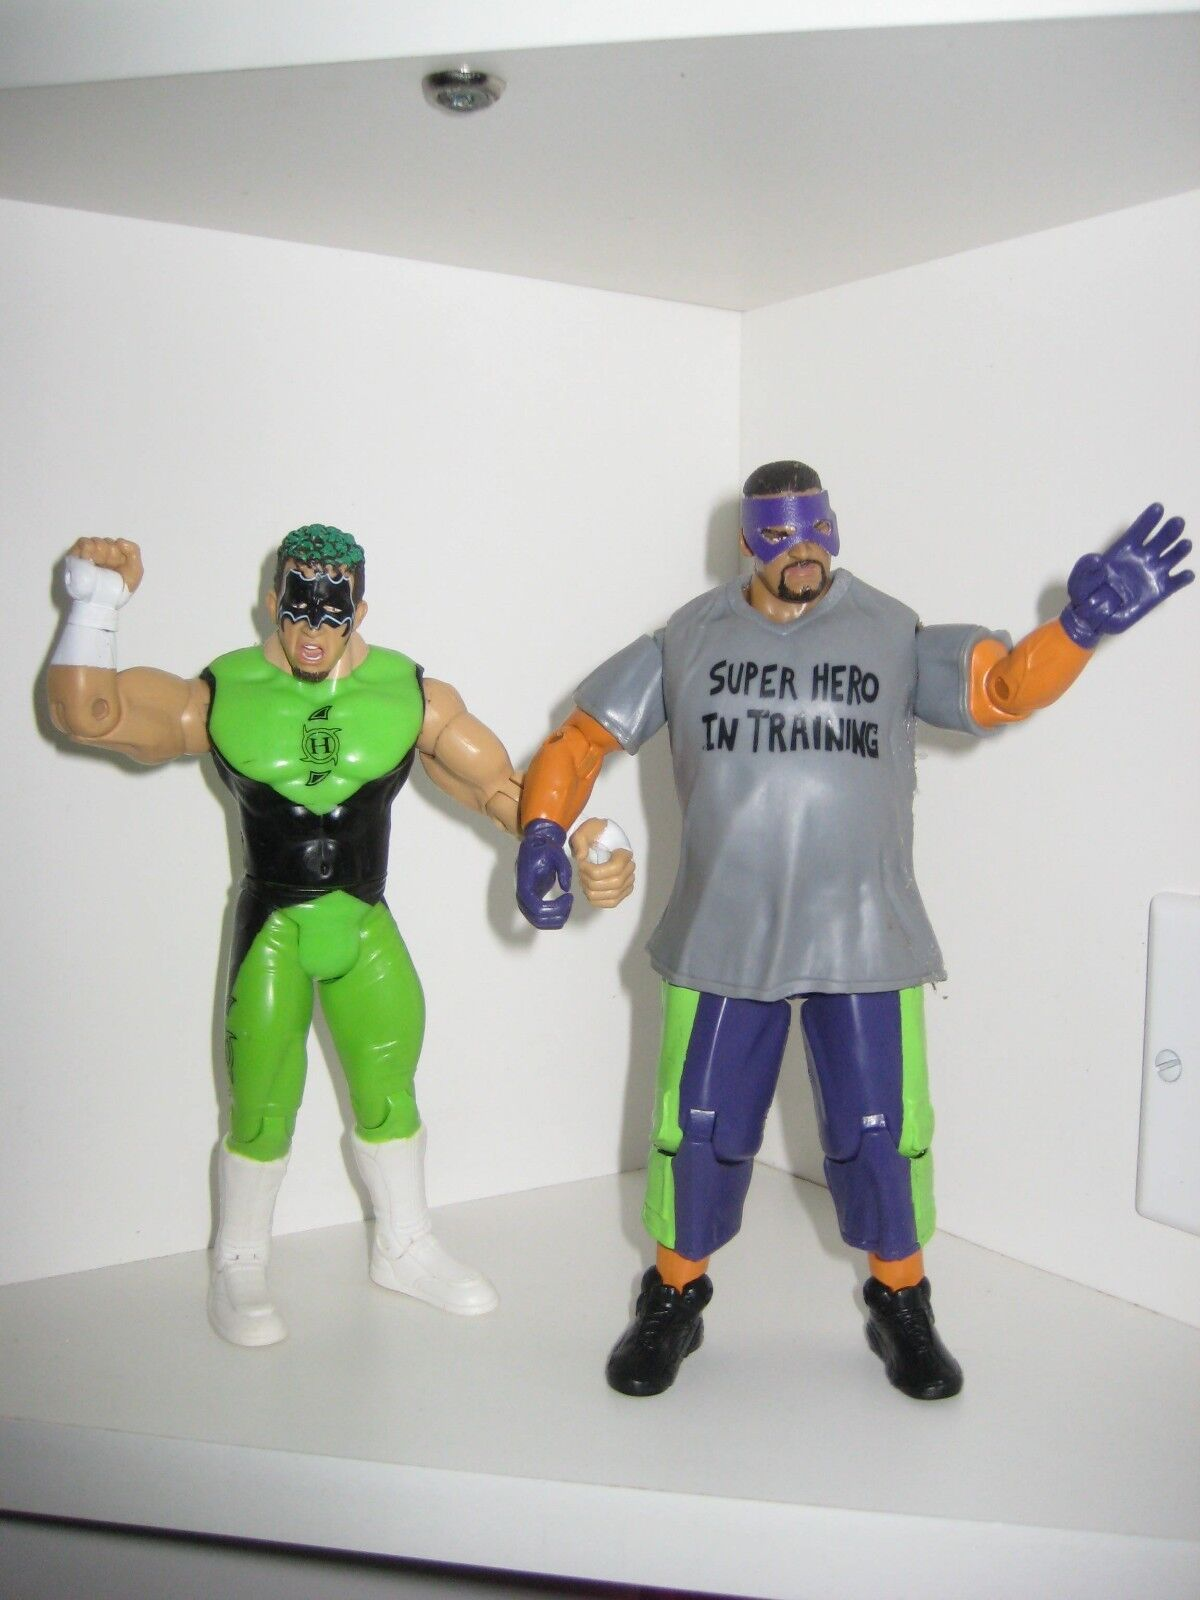 WWE WWF WCW Hurricane Shane Helms pinky Super Hero in Training 2003 Adrenaline